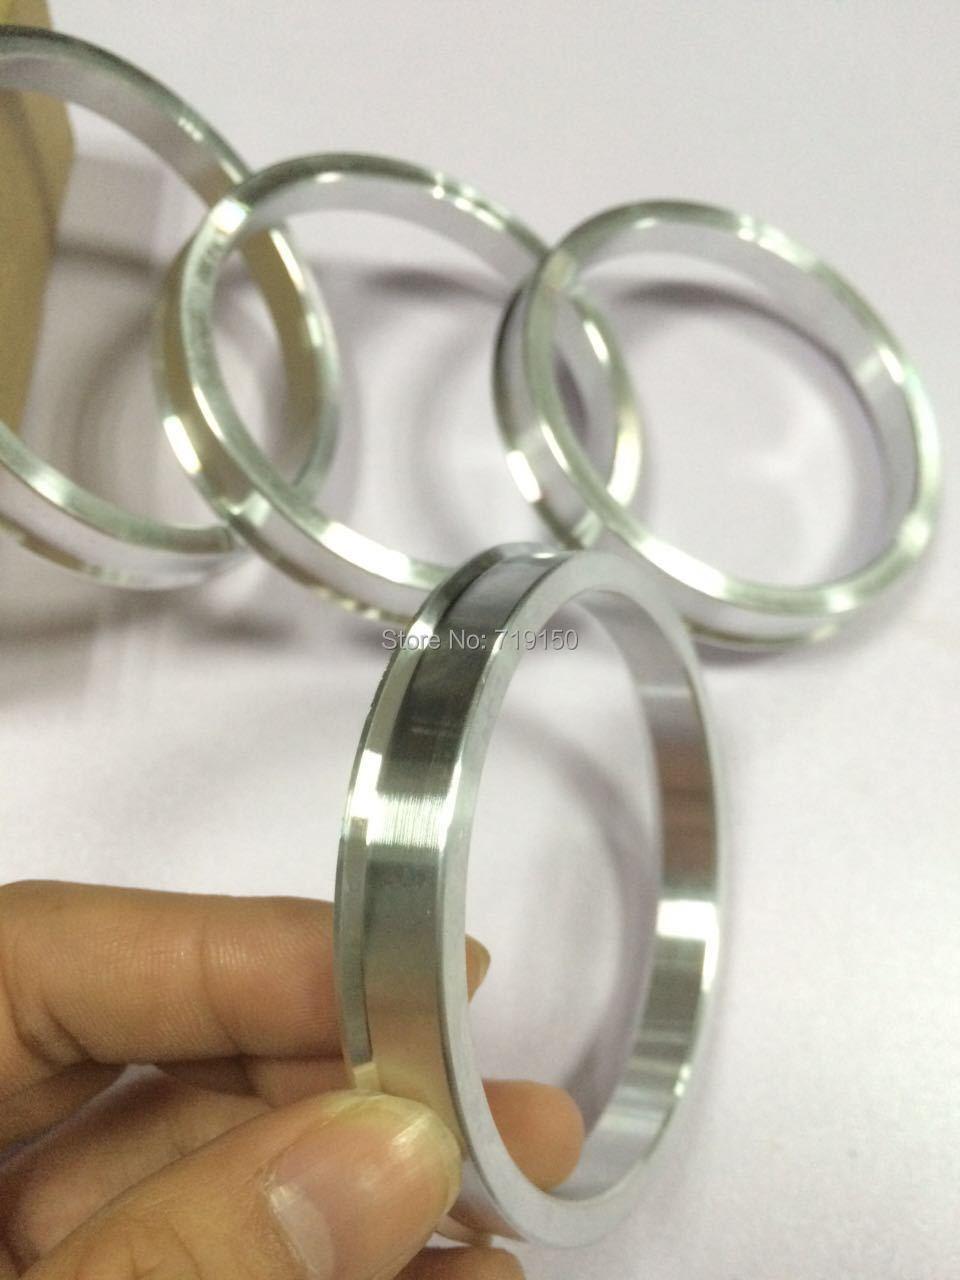 4 pieces / lots 73.1 UNTUK 66.1 Hub Centric Rings OD = 73.1mm ID = 66.1mm Aluminium Roda hub rings Gratis Pengiriman